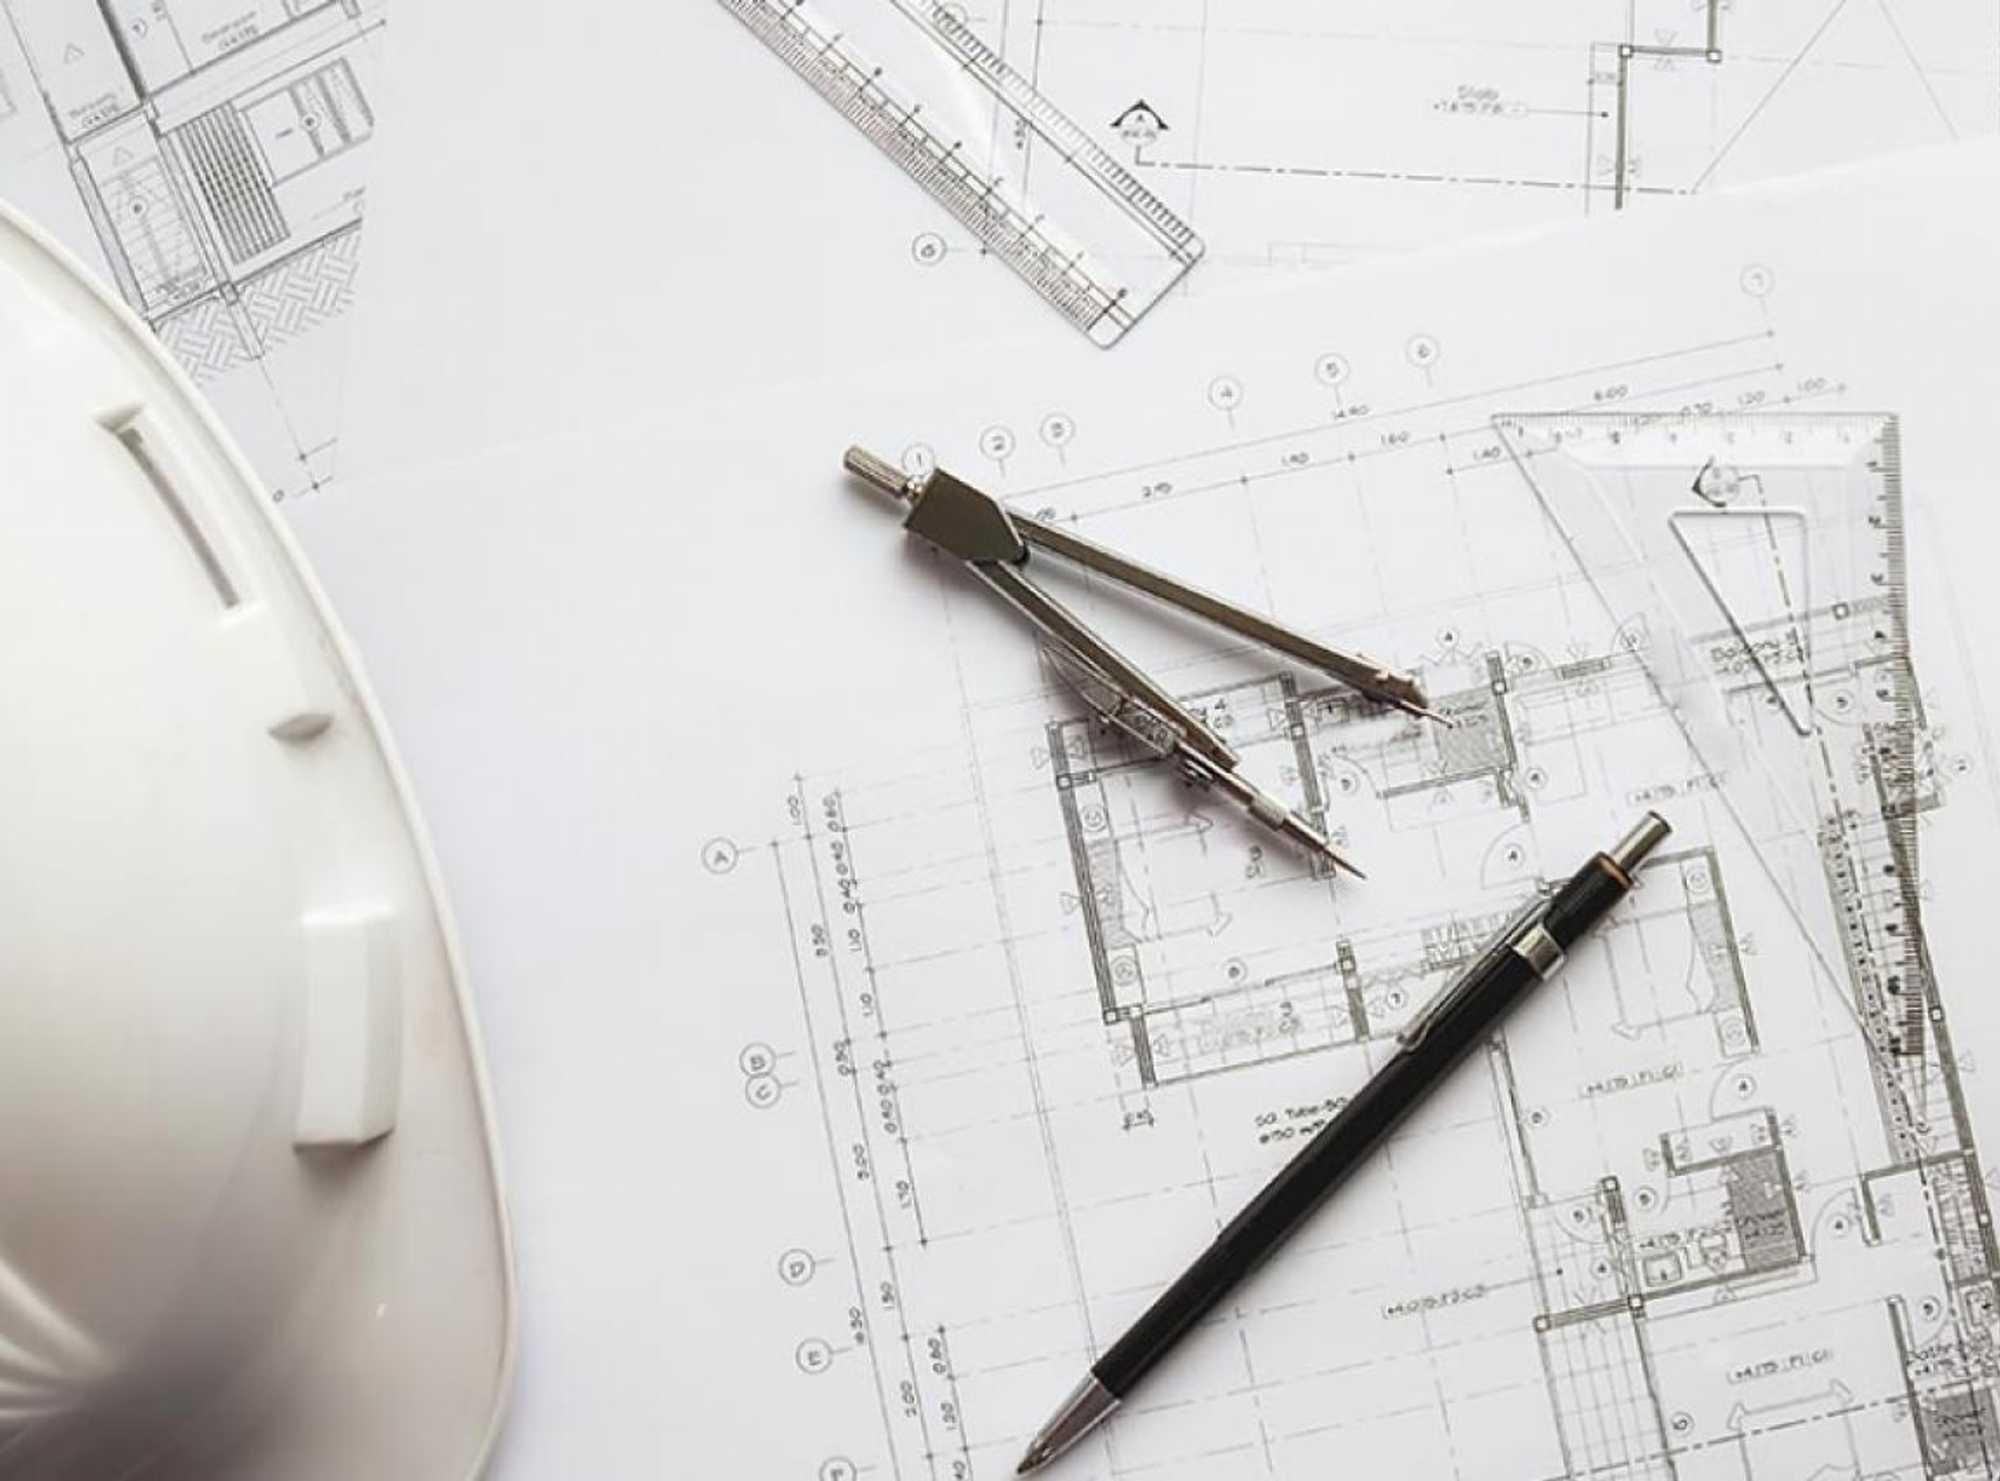 Accruent - Resources - Webinars - The Key to Managing Your Engineering Documentation - Hero